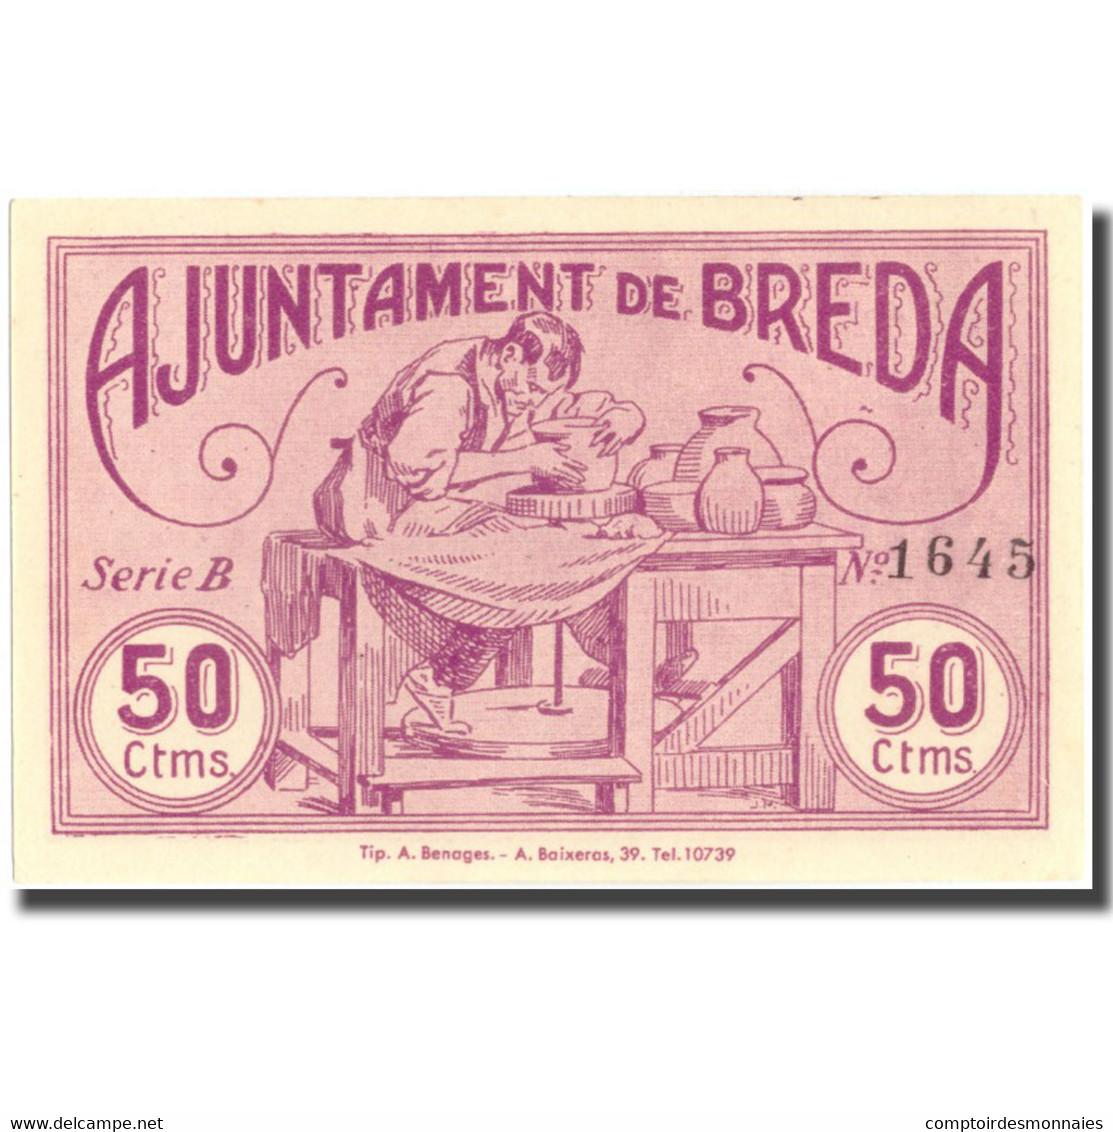 Billet, Espagne, 50 Centimos, N.D, BREDA, 1937-05-11, NEUF - Espagne